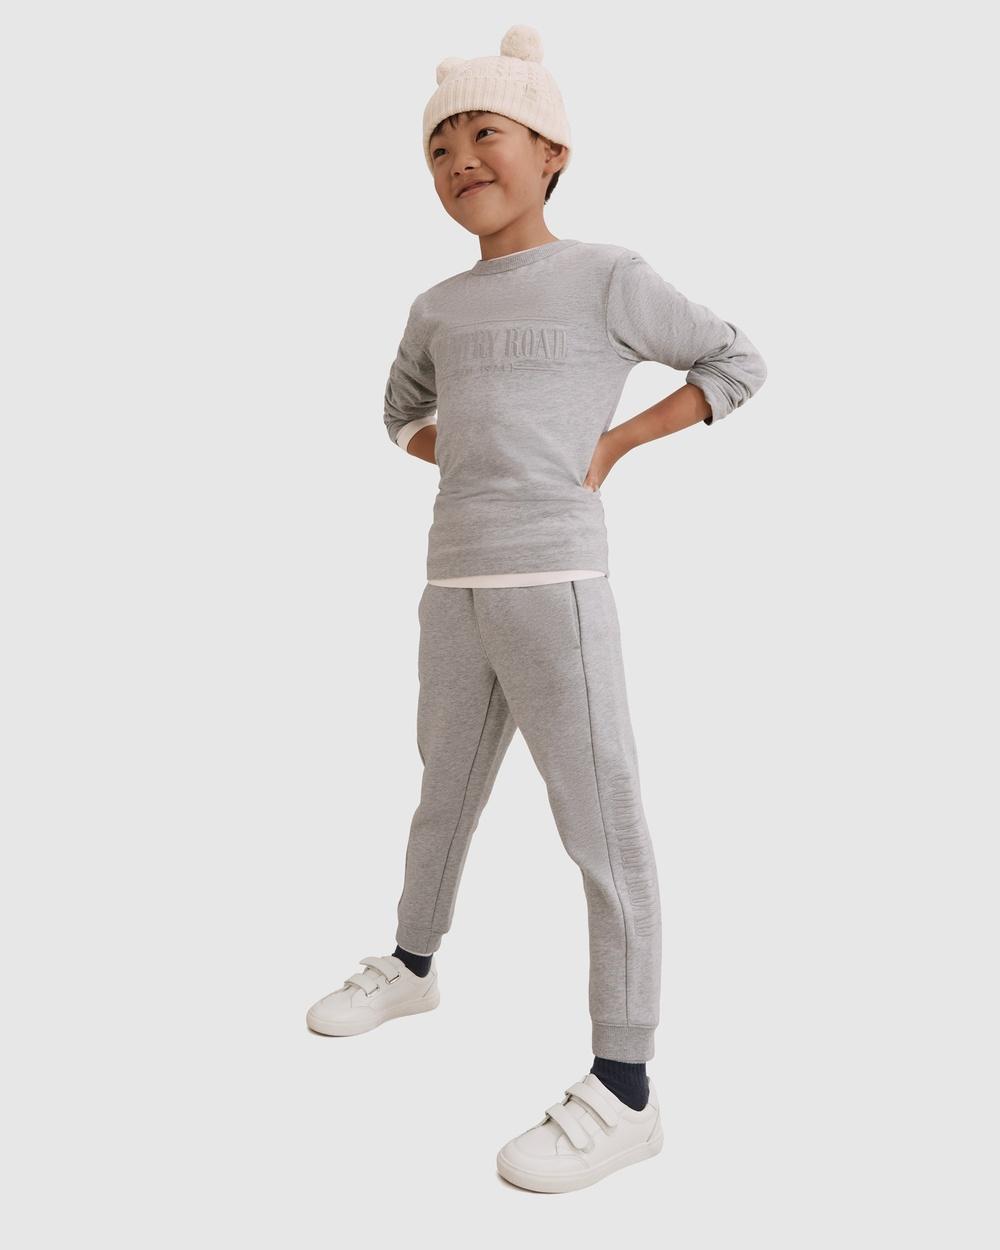 Country Road Verified Australian Cotton Long Sleeve Heritage T shirt T-Shirts & Singlets grey T-shirt Australia